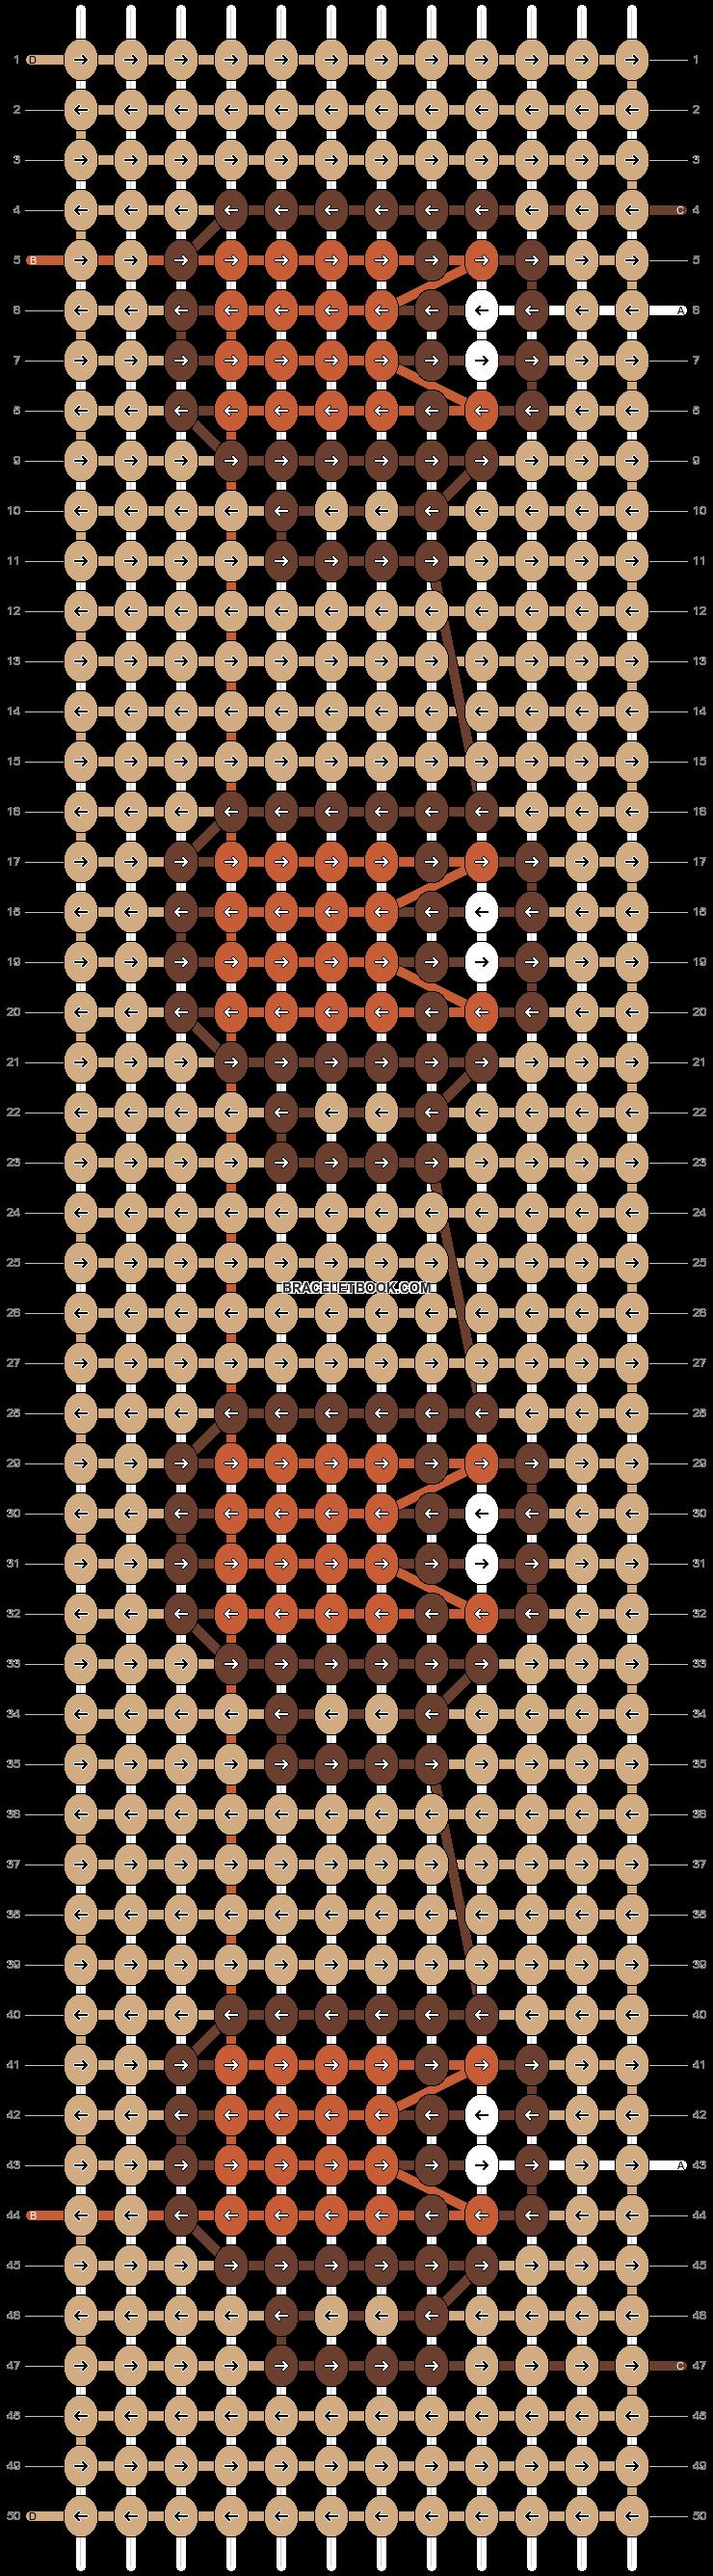 Alpha pattern #53653 pattern